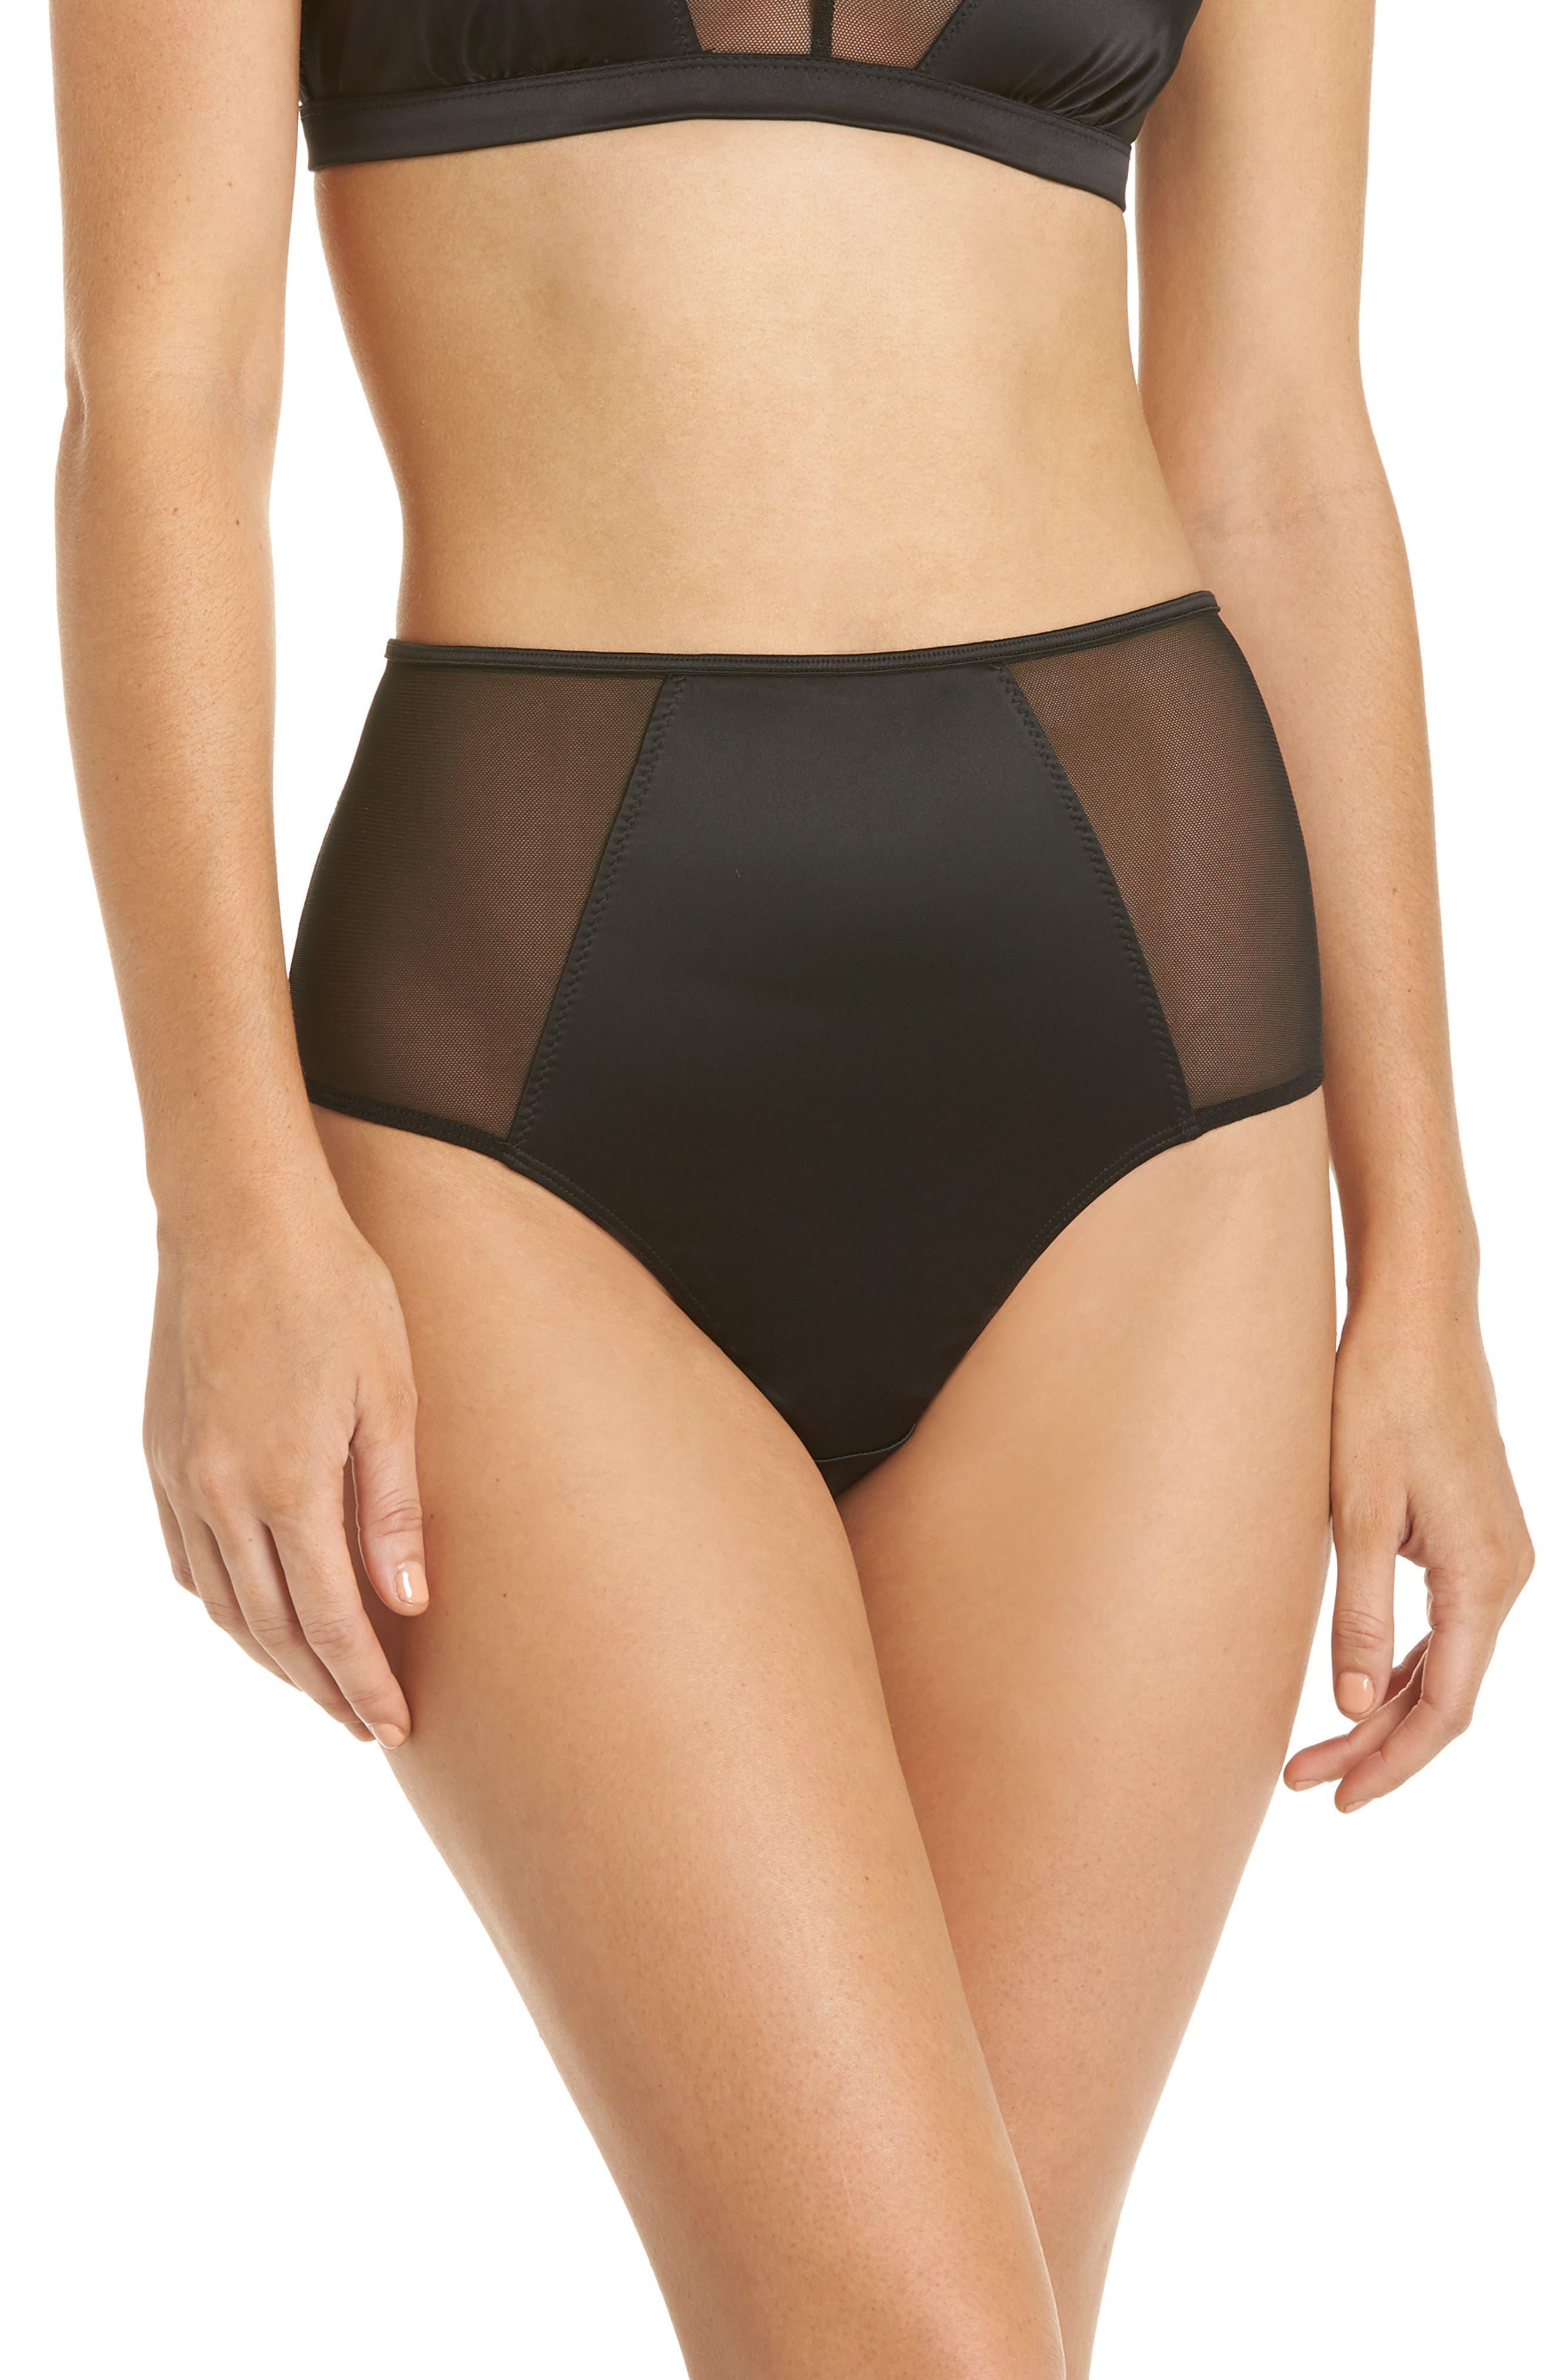 1950s Lingerie History – Bras, Girdles, Slips, Panties, Garters Womens Halogen Luster High Waist Panties Size Small - Black $19.00 AT vintagedancer.com